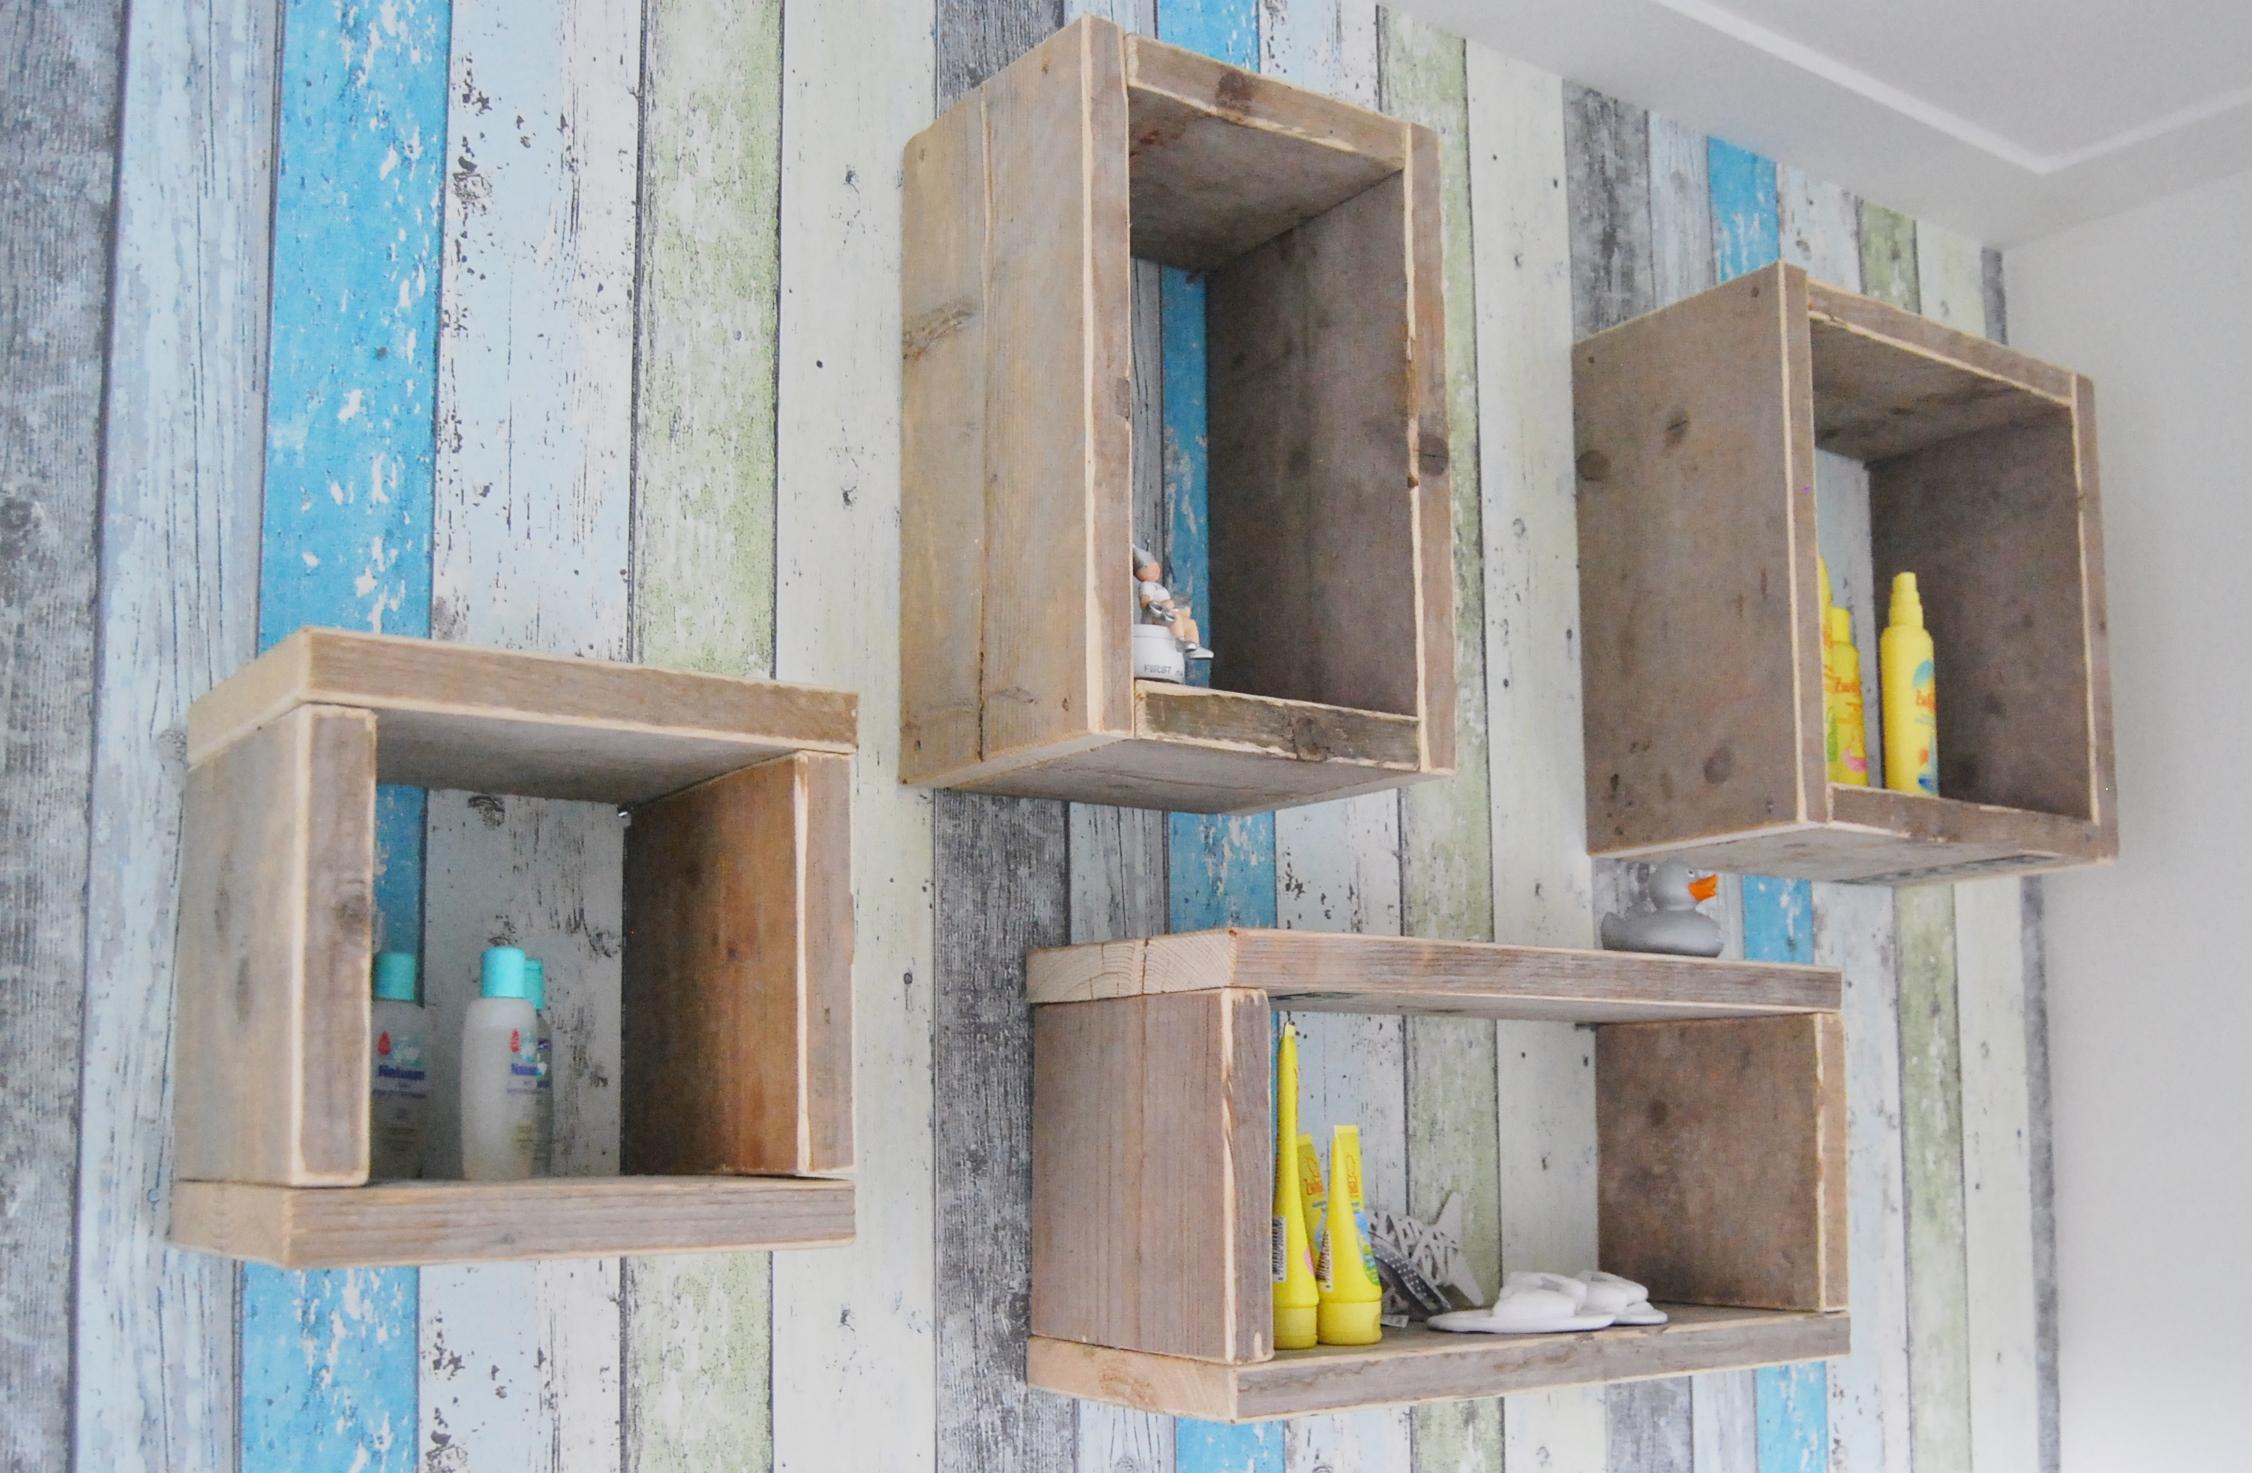 Boeken kasten steigerhout bouw en onderhoudsbedrijf m lankreijer - Decoratie zolder ...